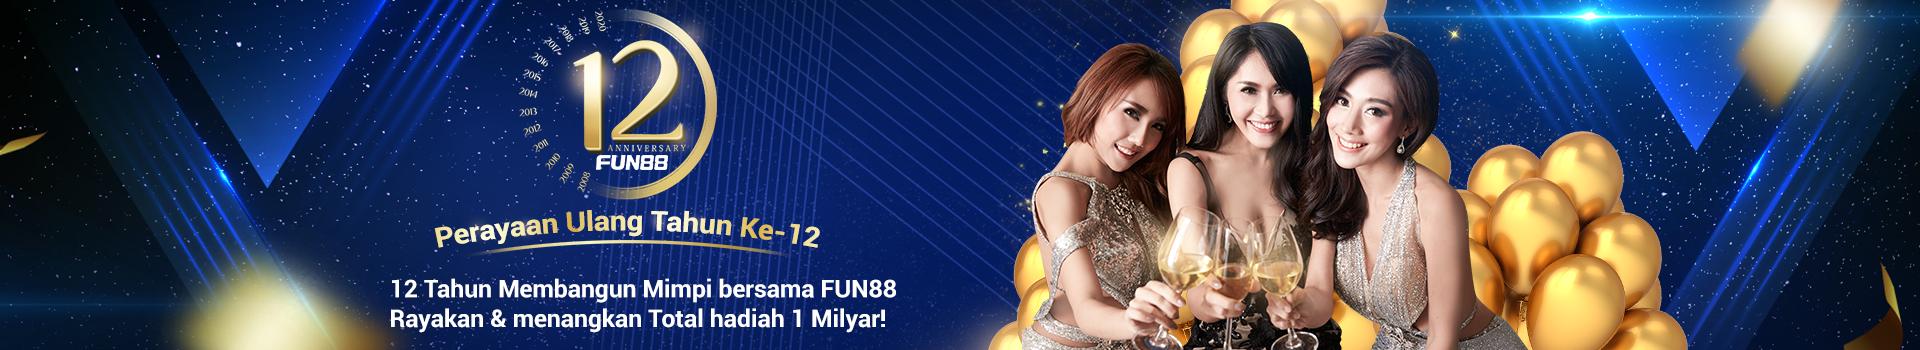 ulang tahun fun88 di indonesia